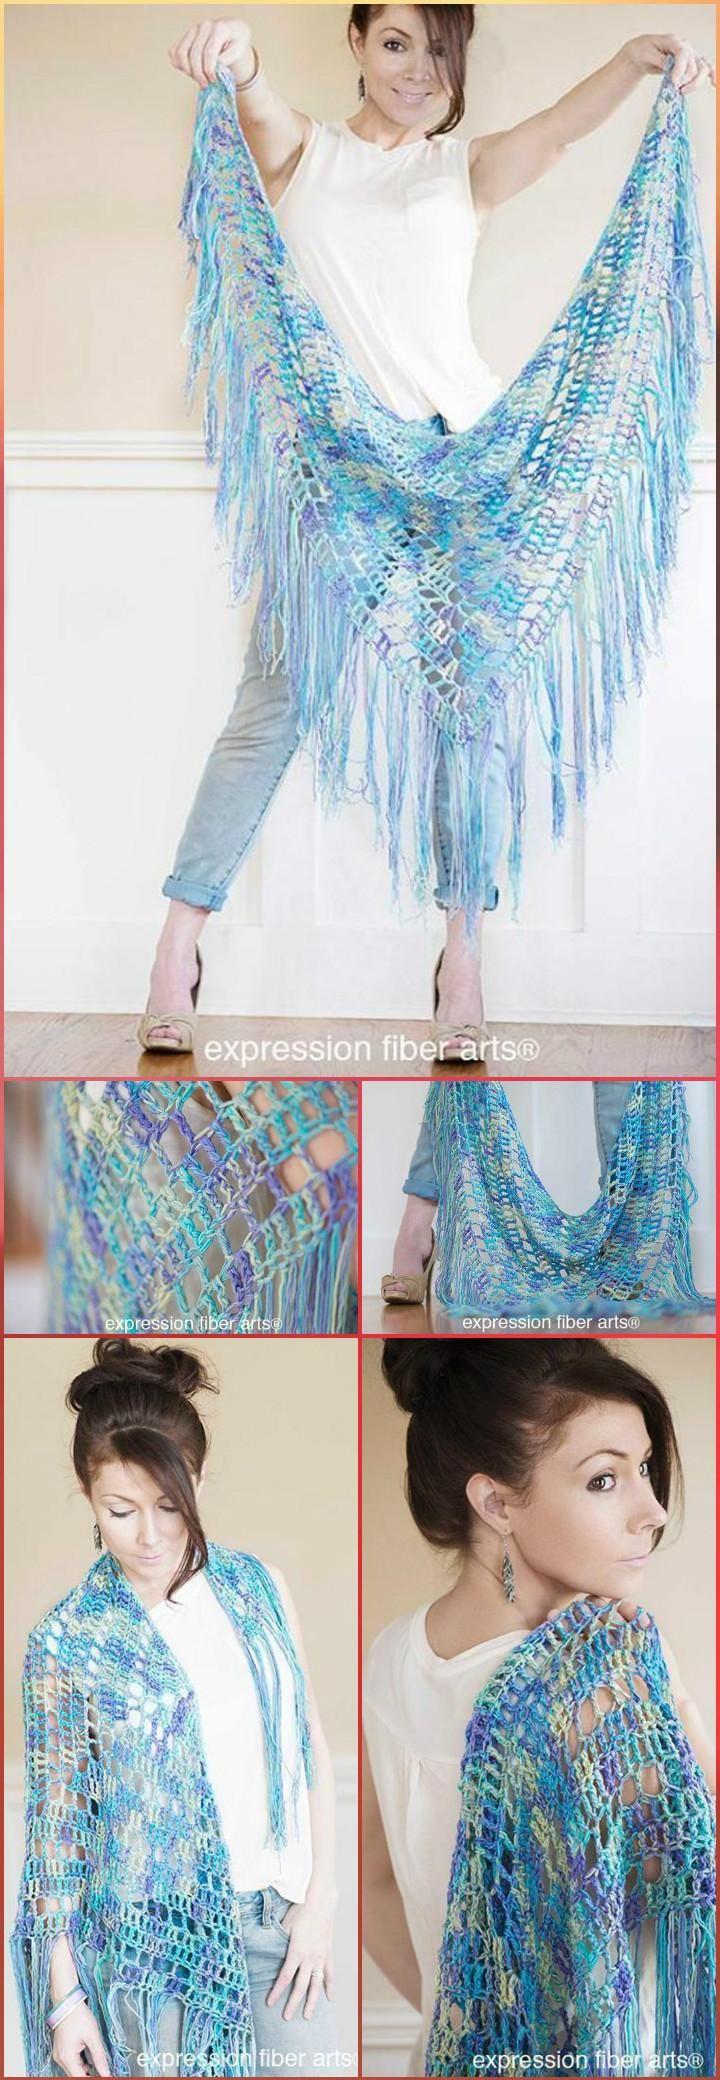 Crochet Boho Triangle Shawl - 100 Free Crochet Shawl Patterns - Free Crochet Patterns - Page 2 of 19 - DIY & Crafts